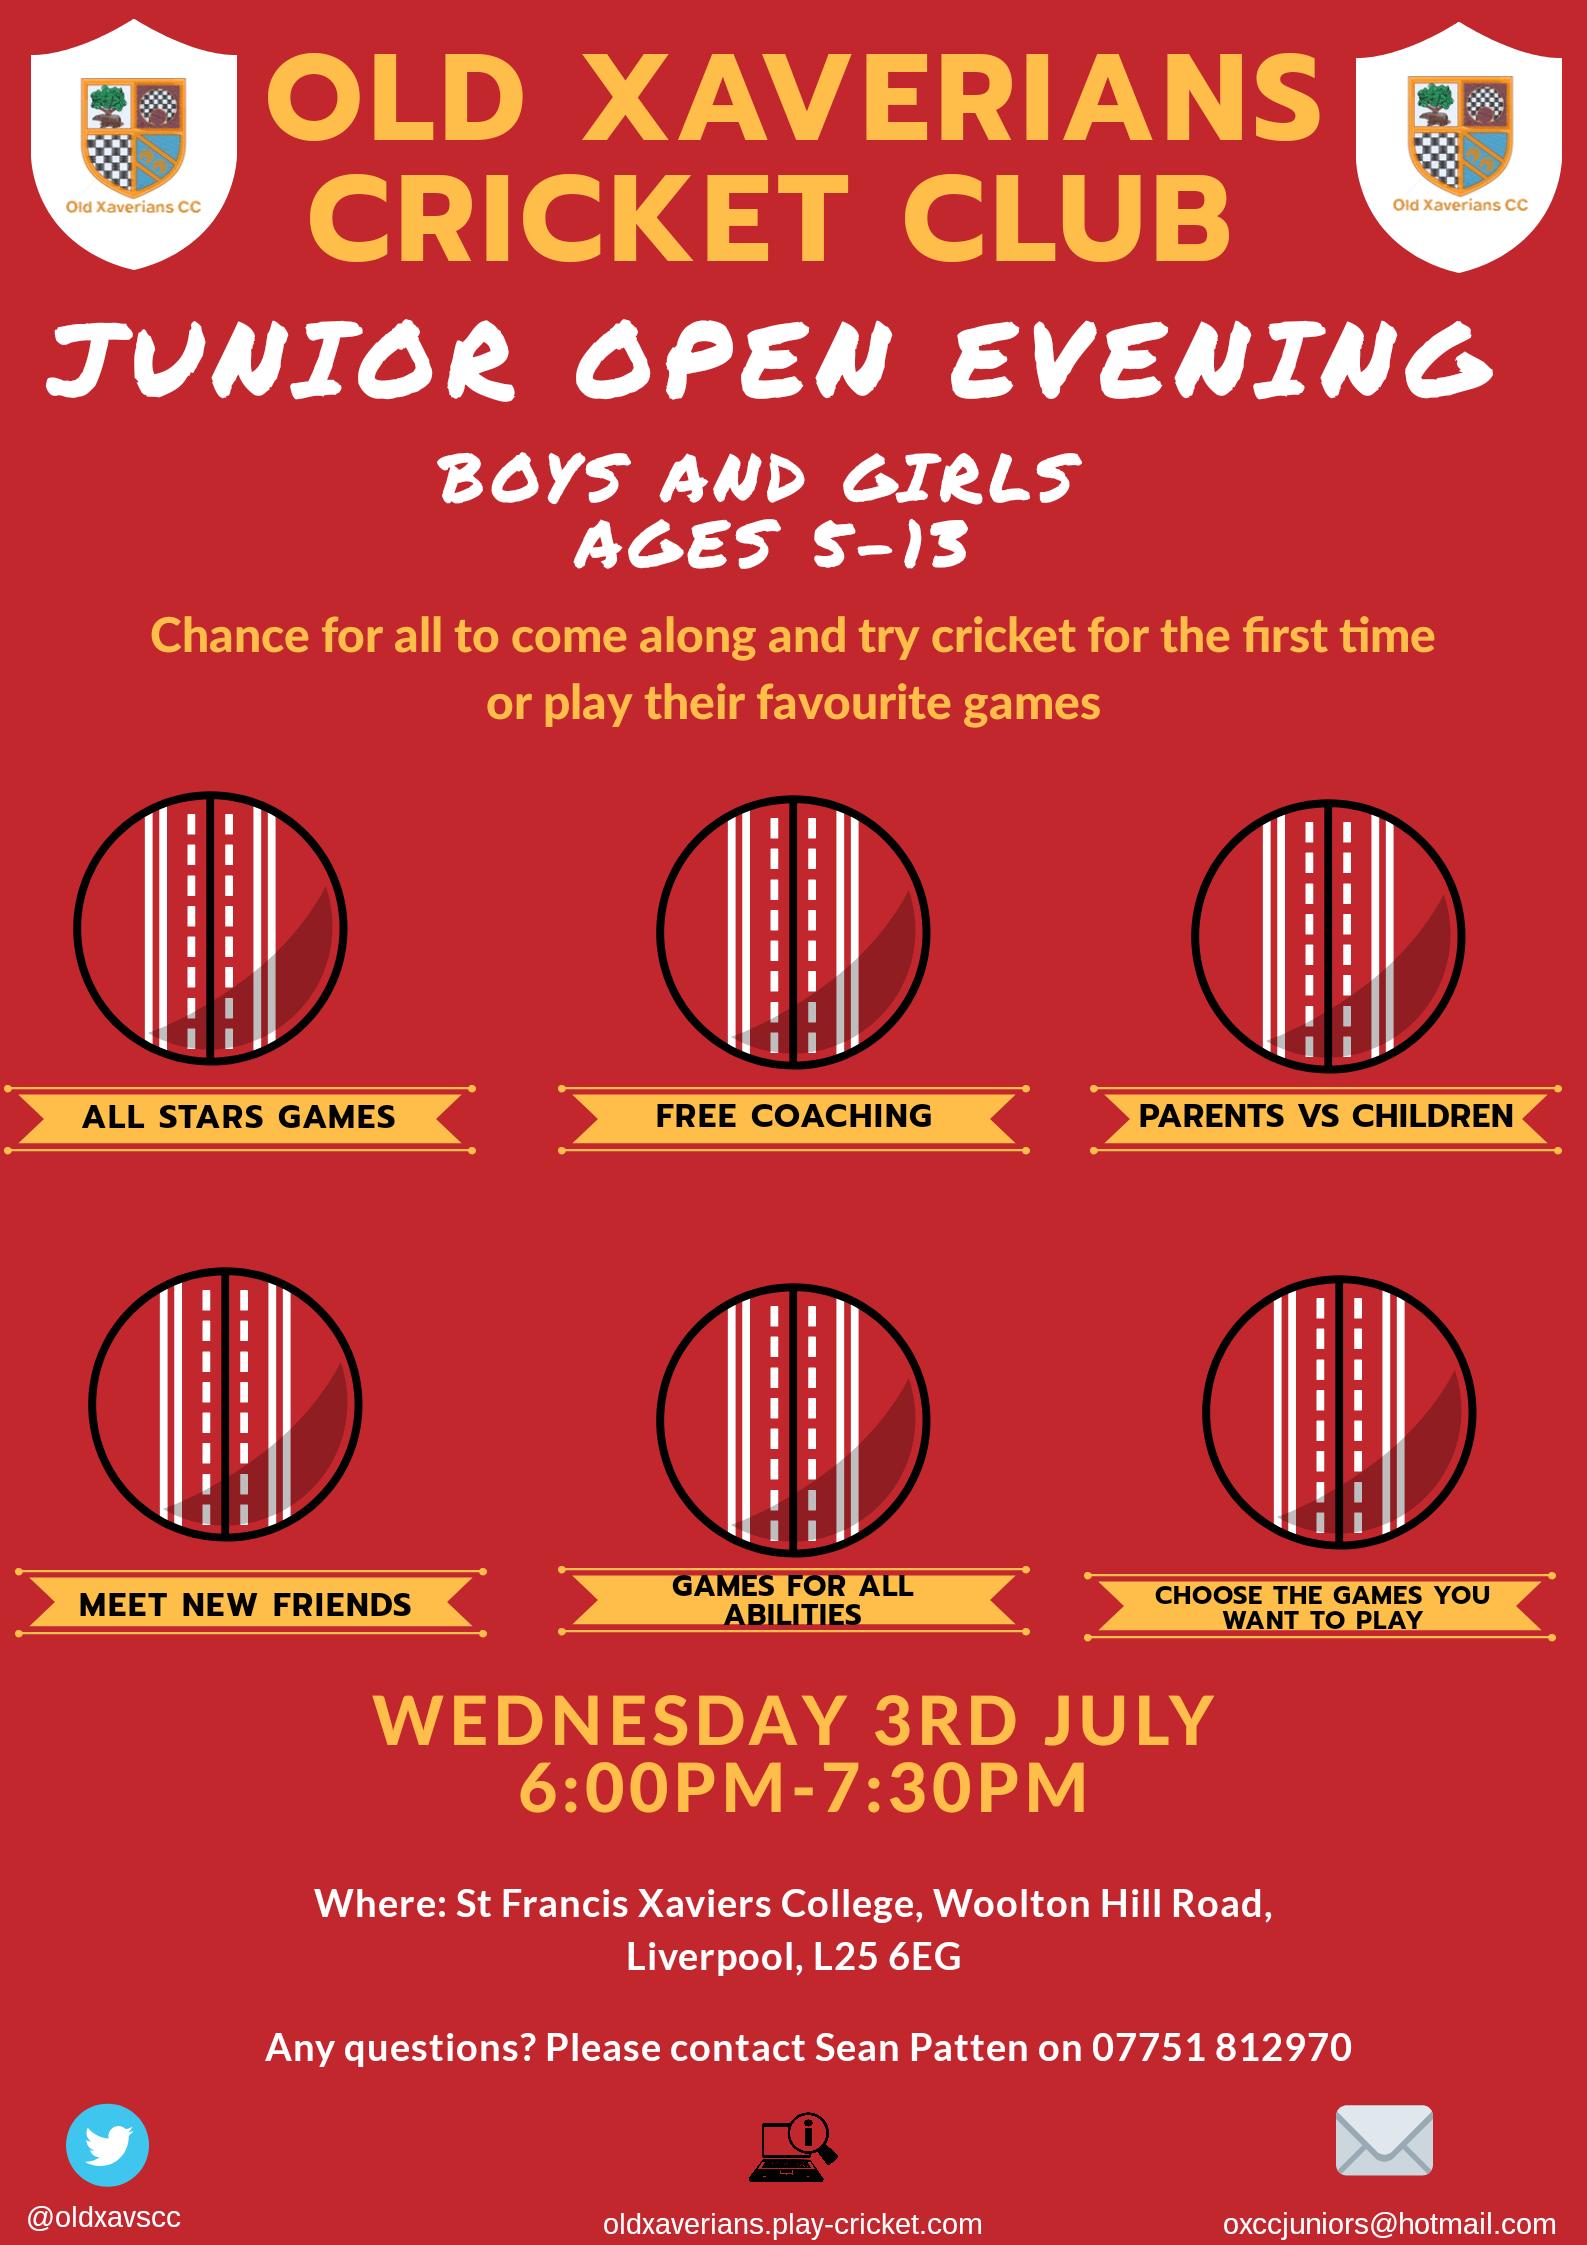 Old Xaverians Cricket Club Open Evening flyer